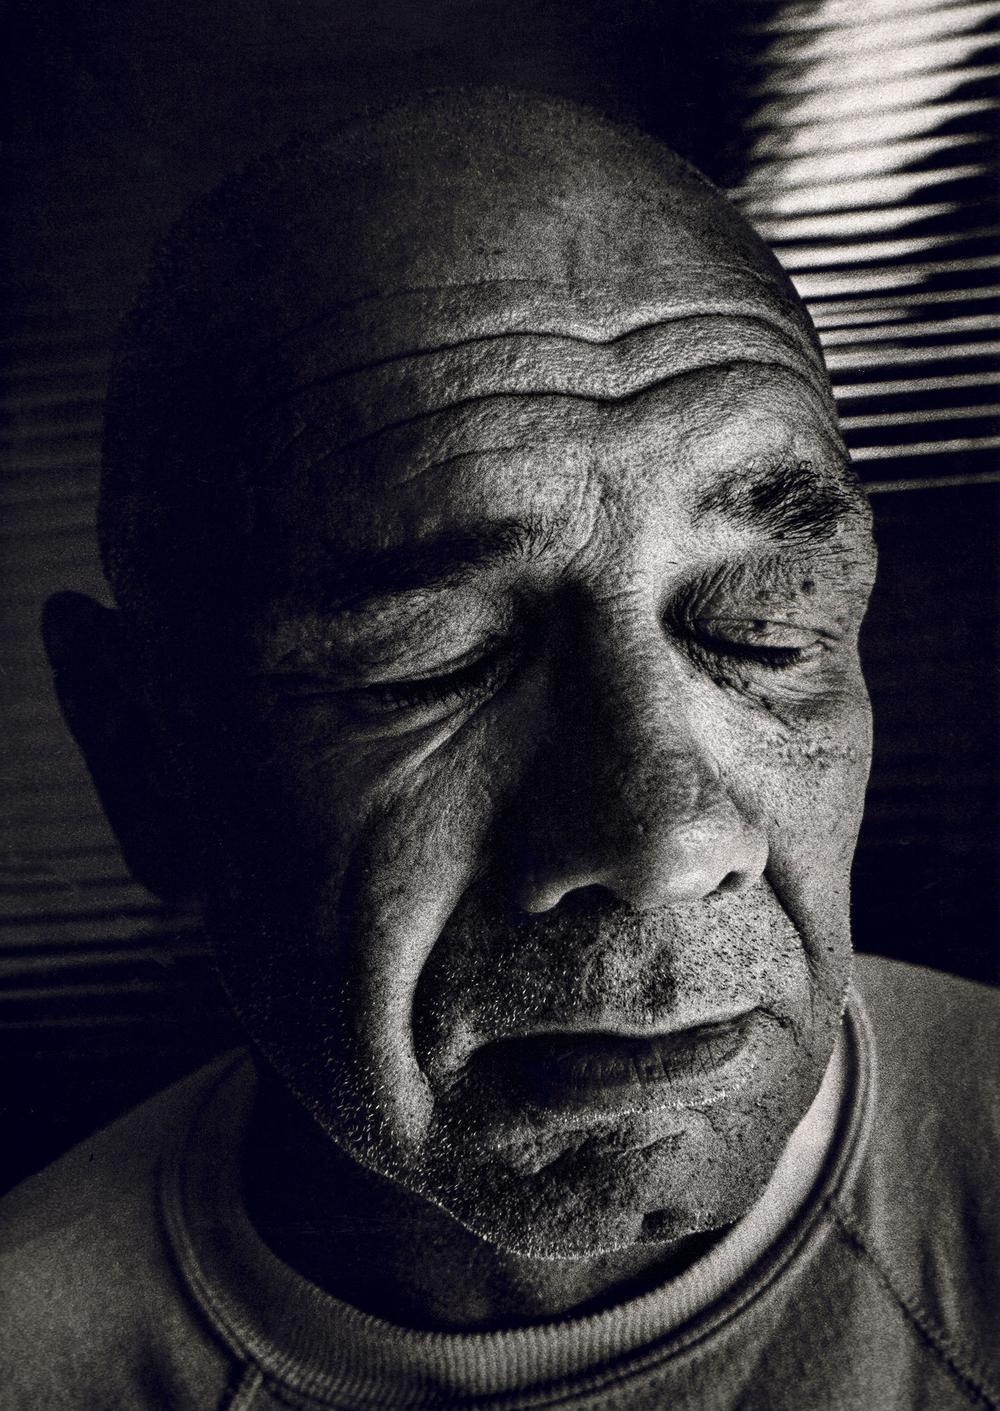 John Apostle, former boxer